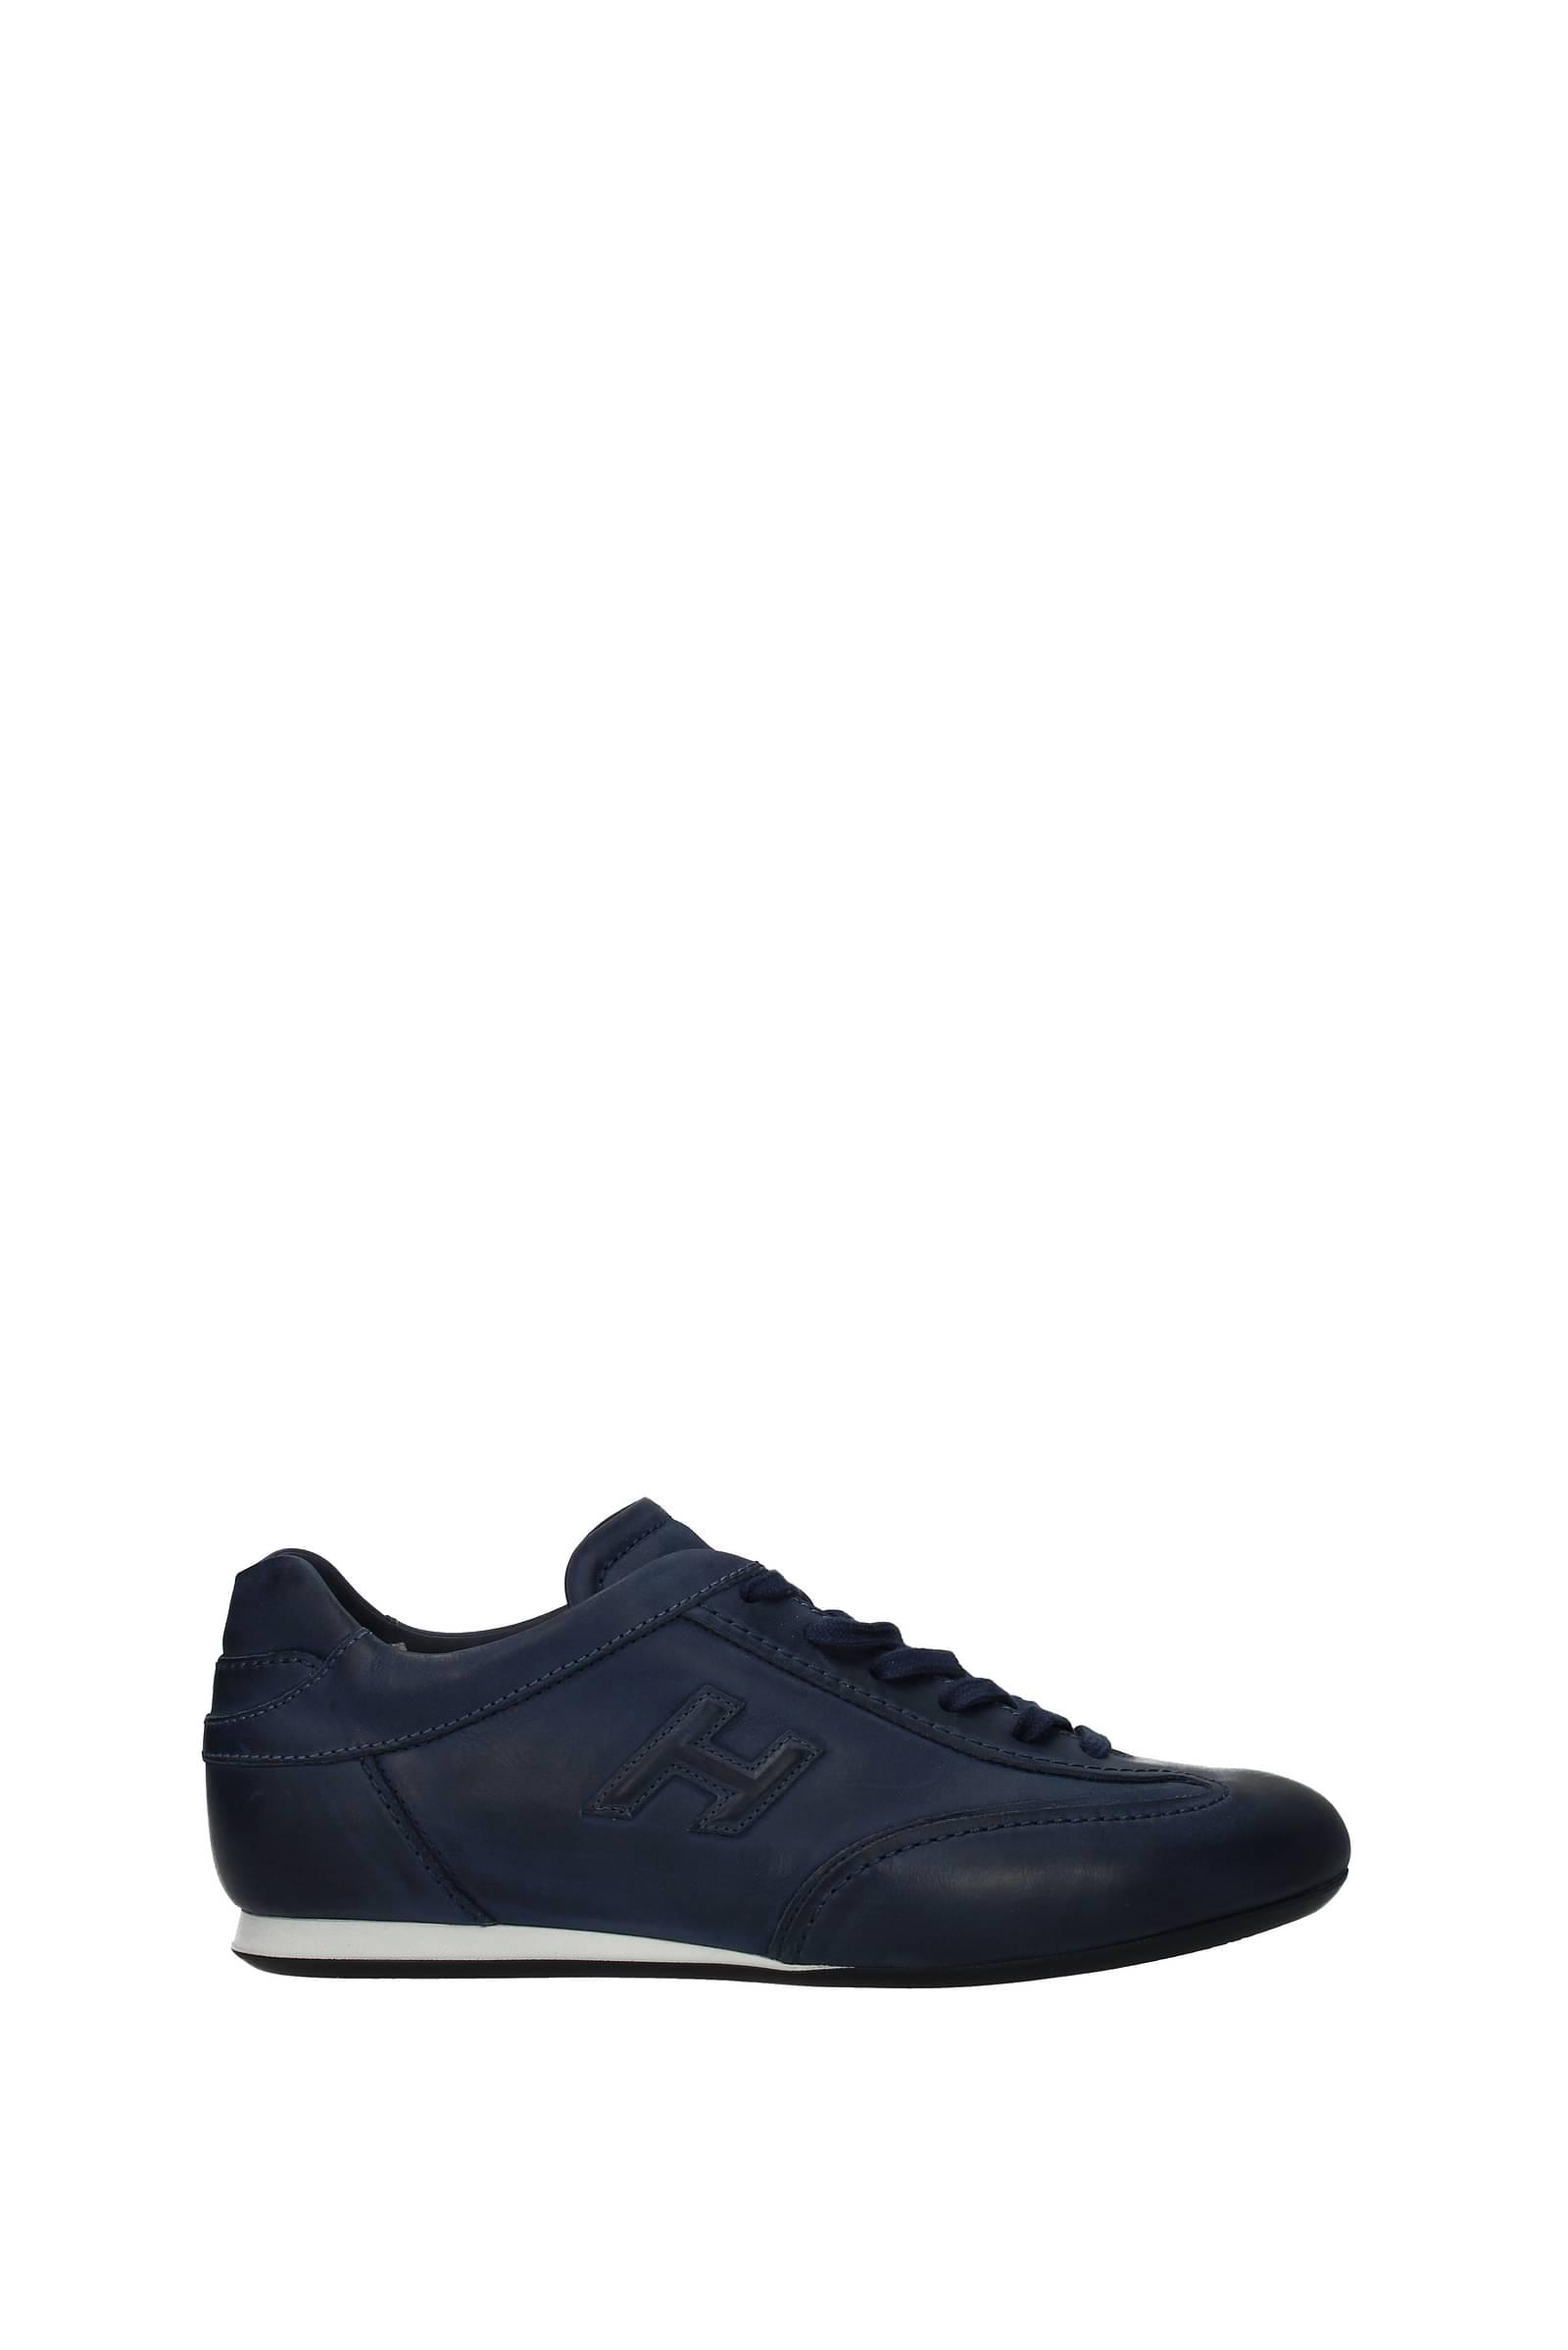 Hogan Sneakers olympia Men Leather Blue Blu Galaxy